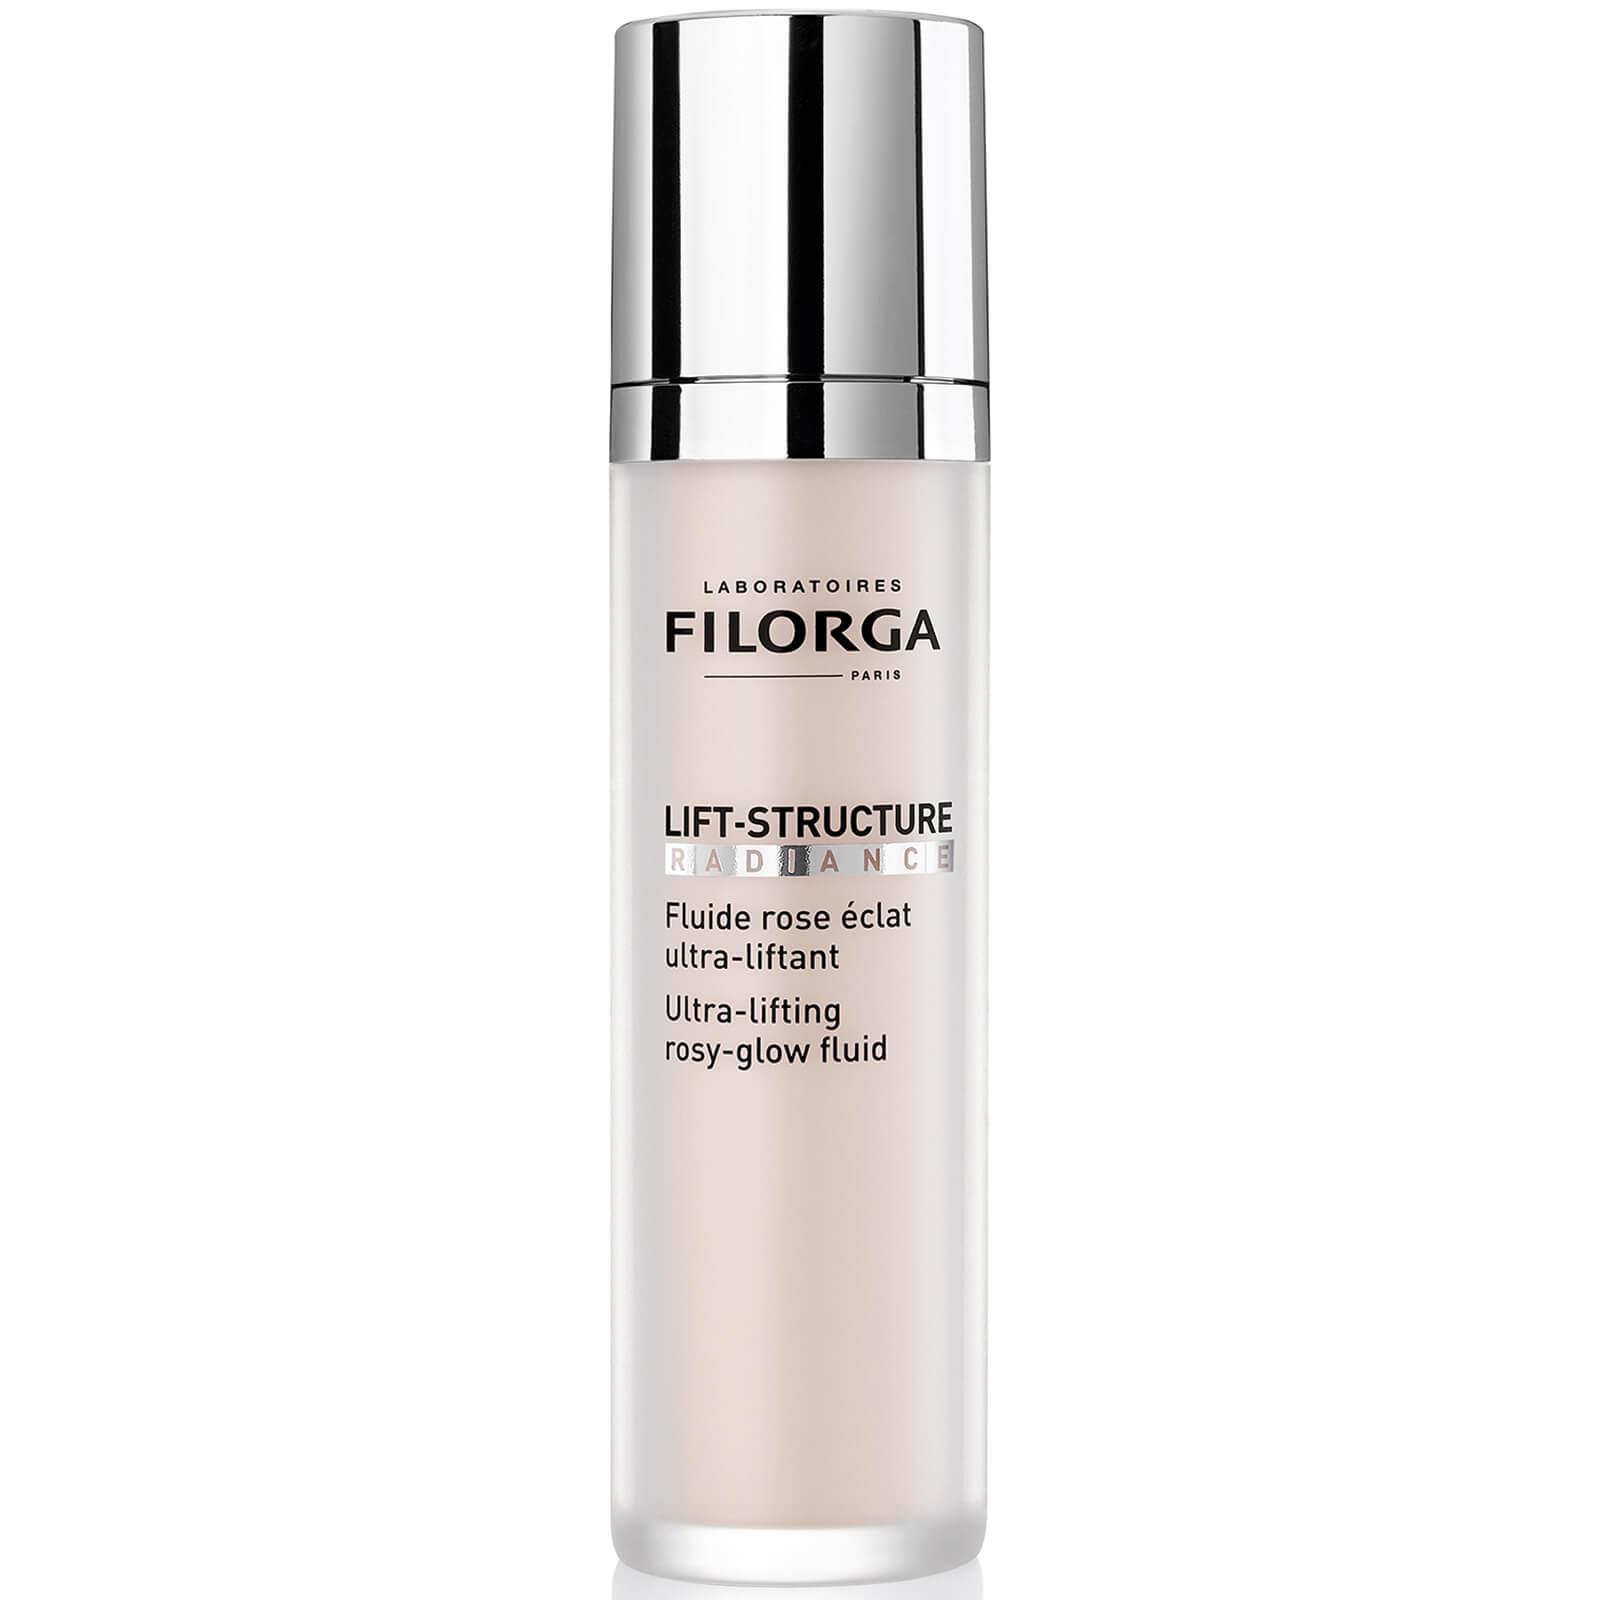 FILORGA LIFT STRUCTURE RADIANCE 50 ML - Nowfarma.it